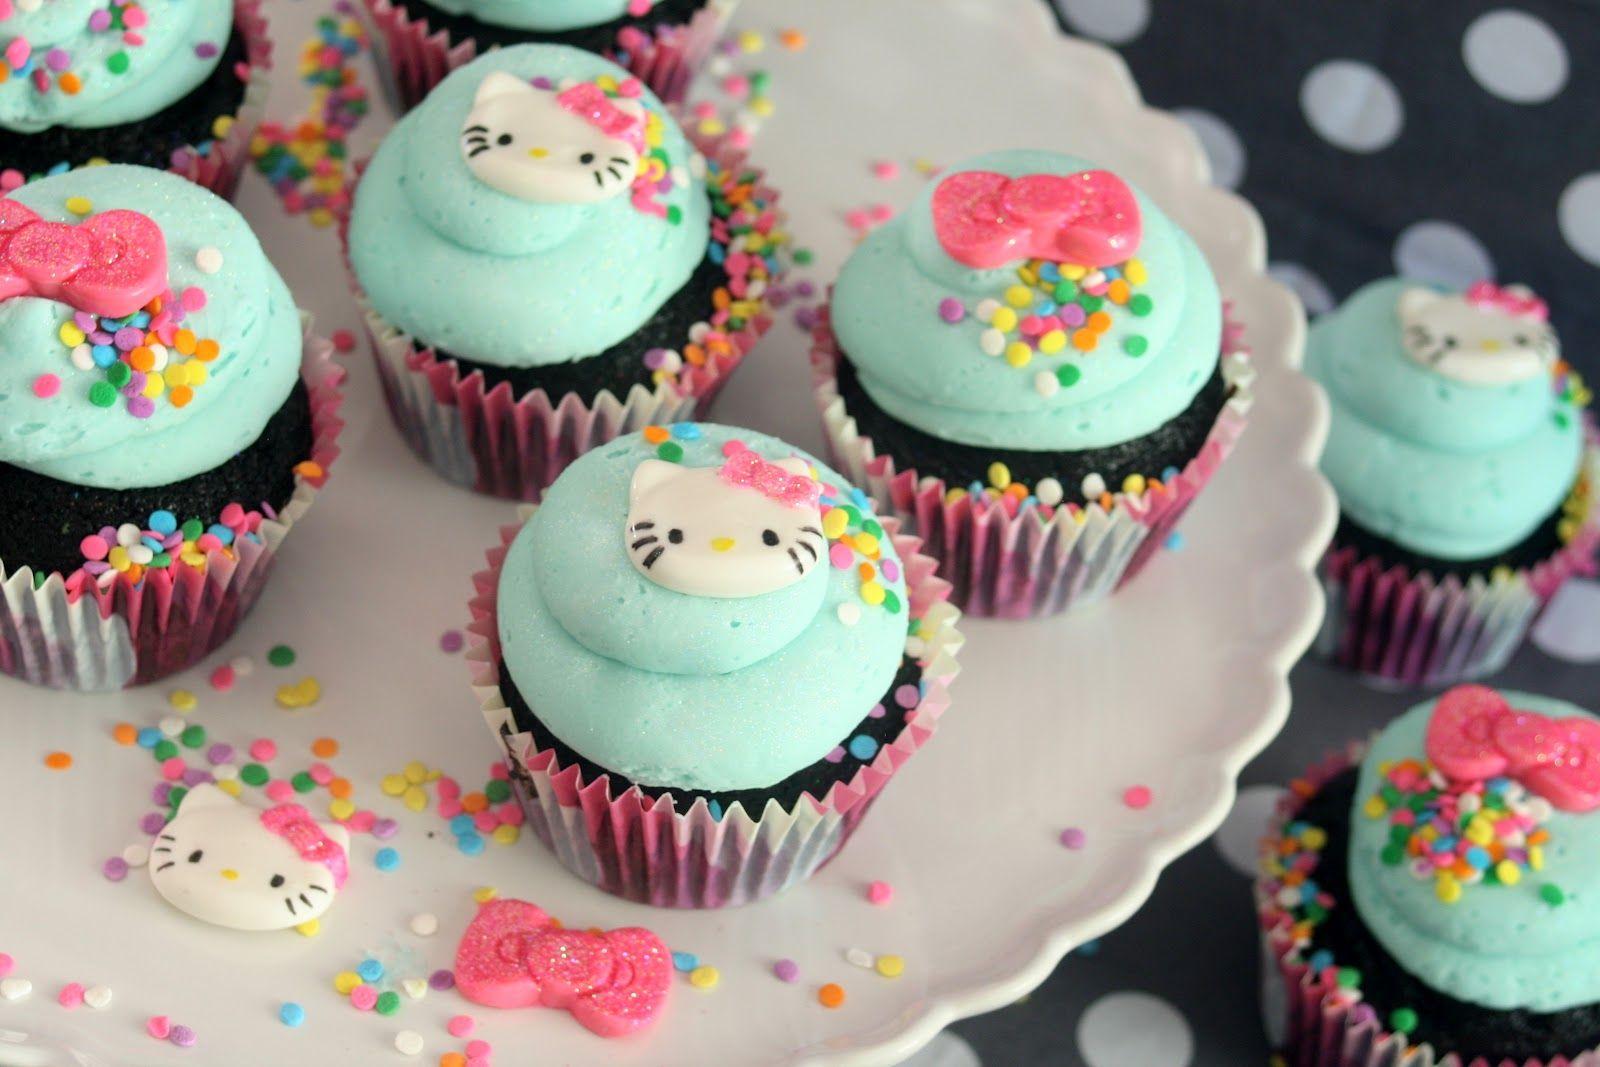 Astonishing Hello Kitty Birthday Cupcakes Hello Kitty Cupcakes Hello Kitty Personalised Birthday Cards Paralily Jamesorg